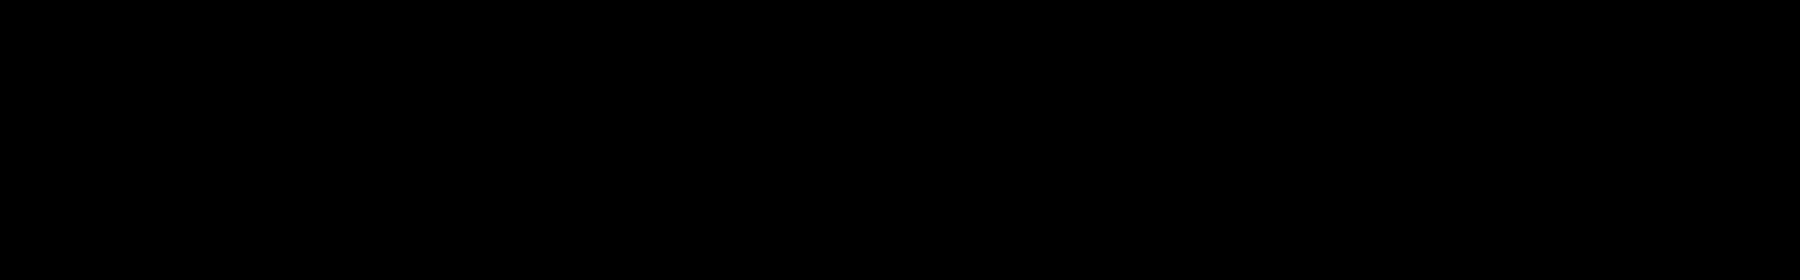 Retro Synth Glow - Serum Presets audio waveform